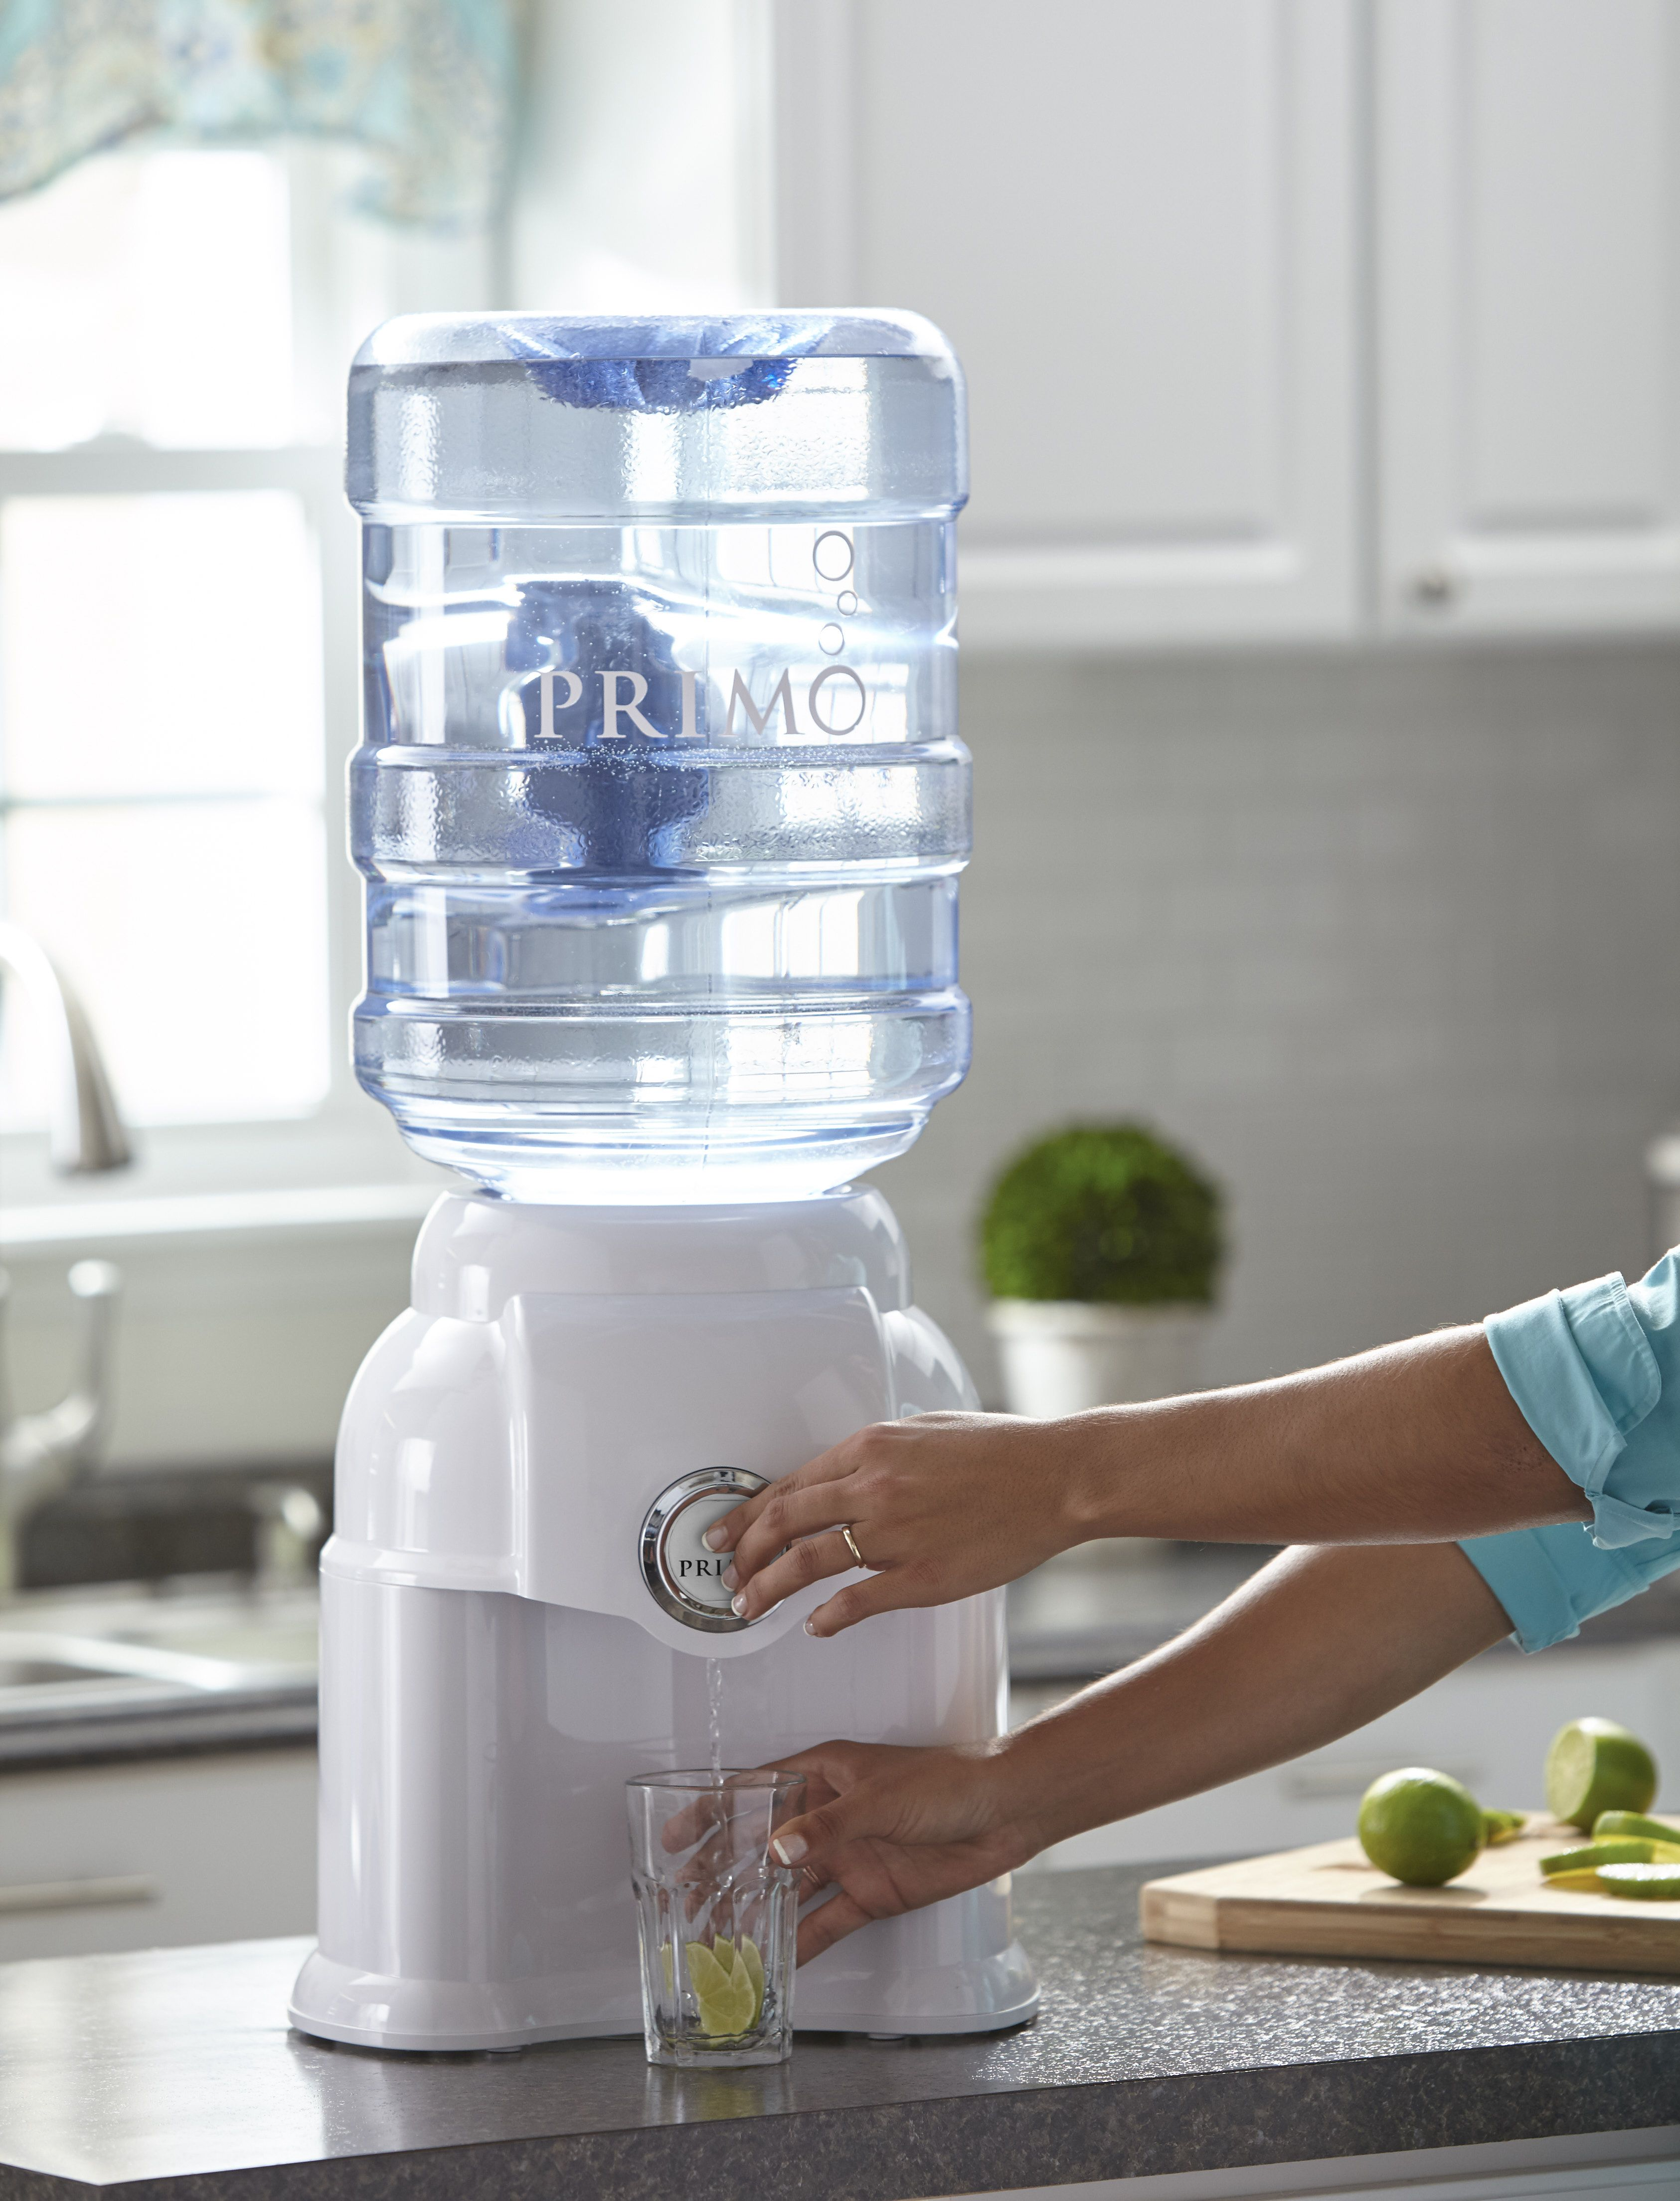 Primo Countertop Water Dispenser White Model 900196 Walmart Com In 2020 Countertop Water Dispenser Water Dispenser Dispenser